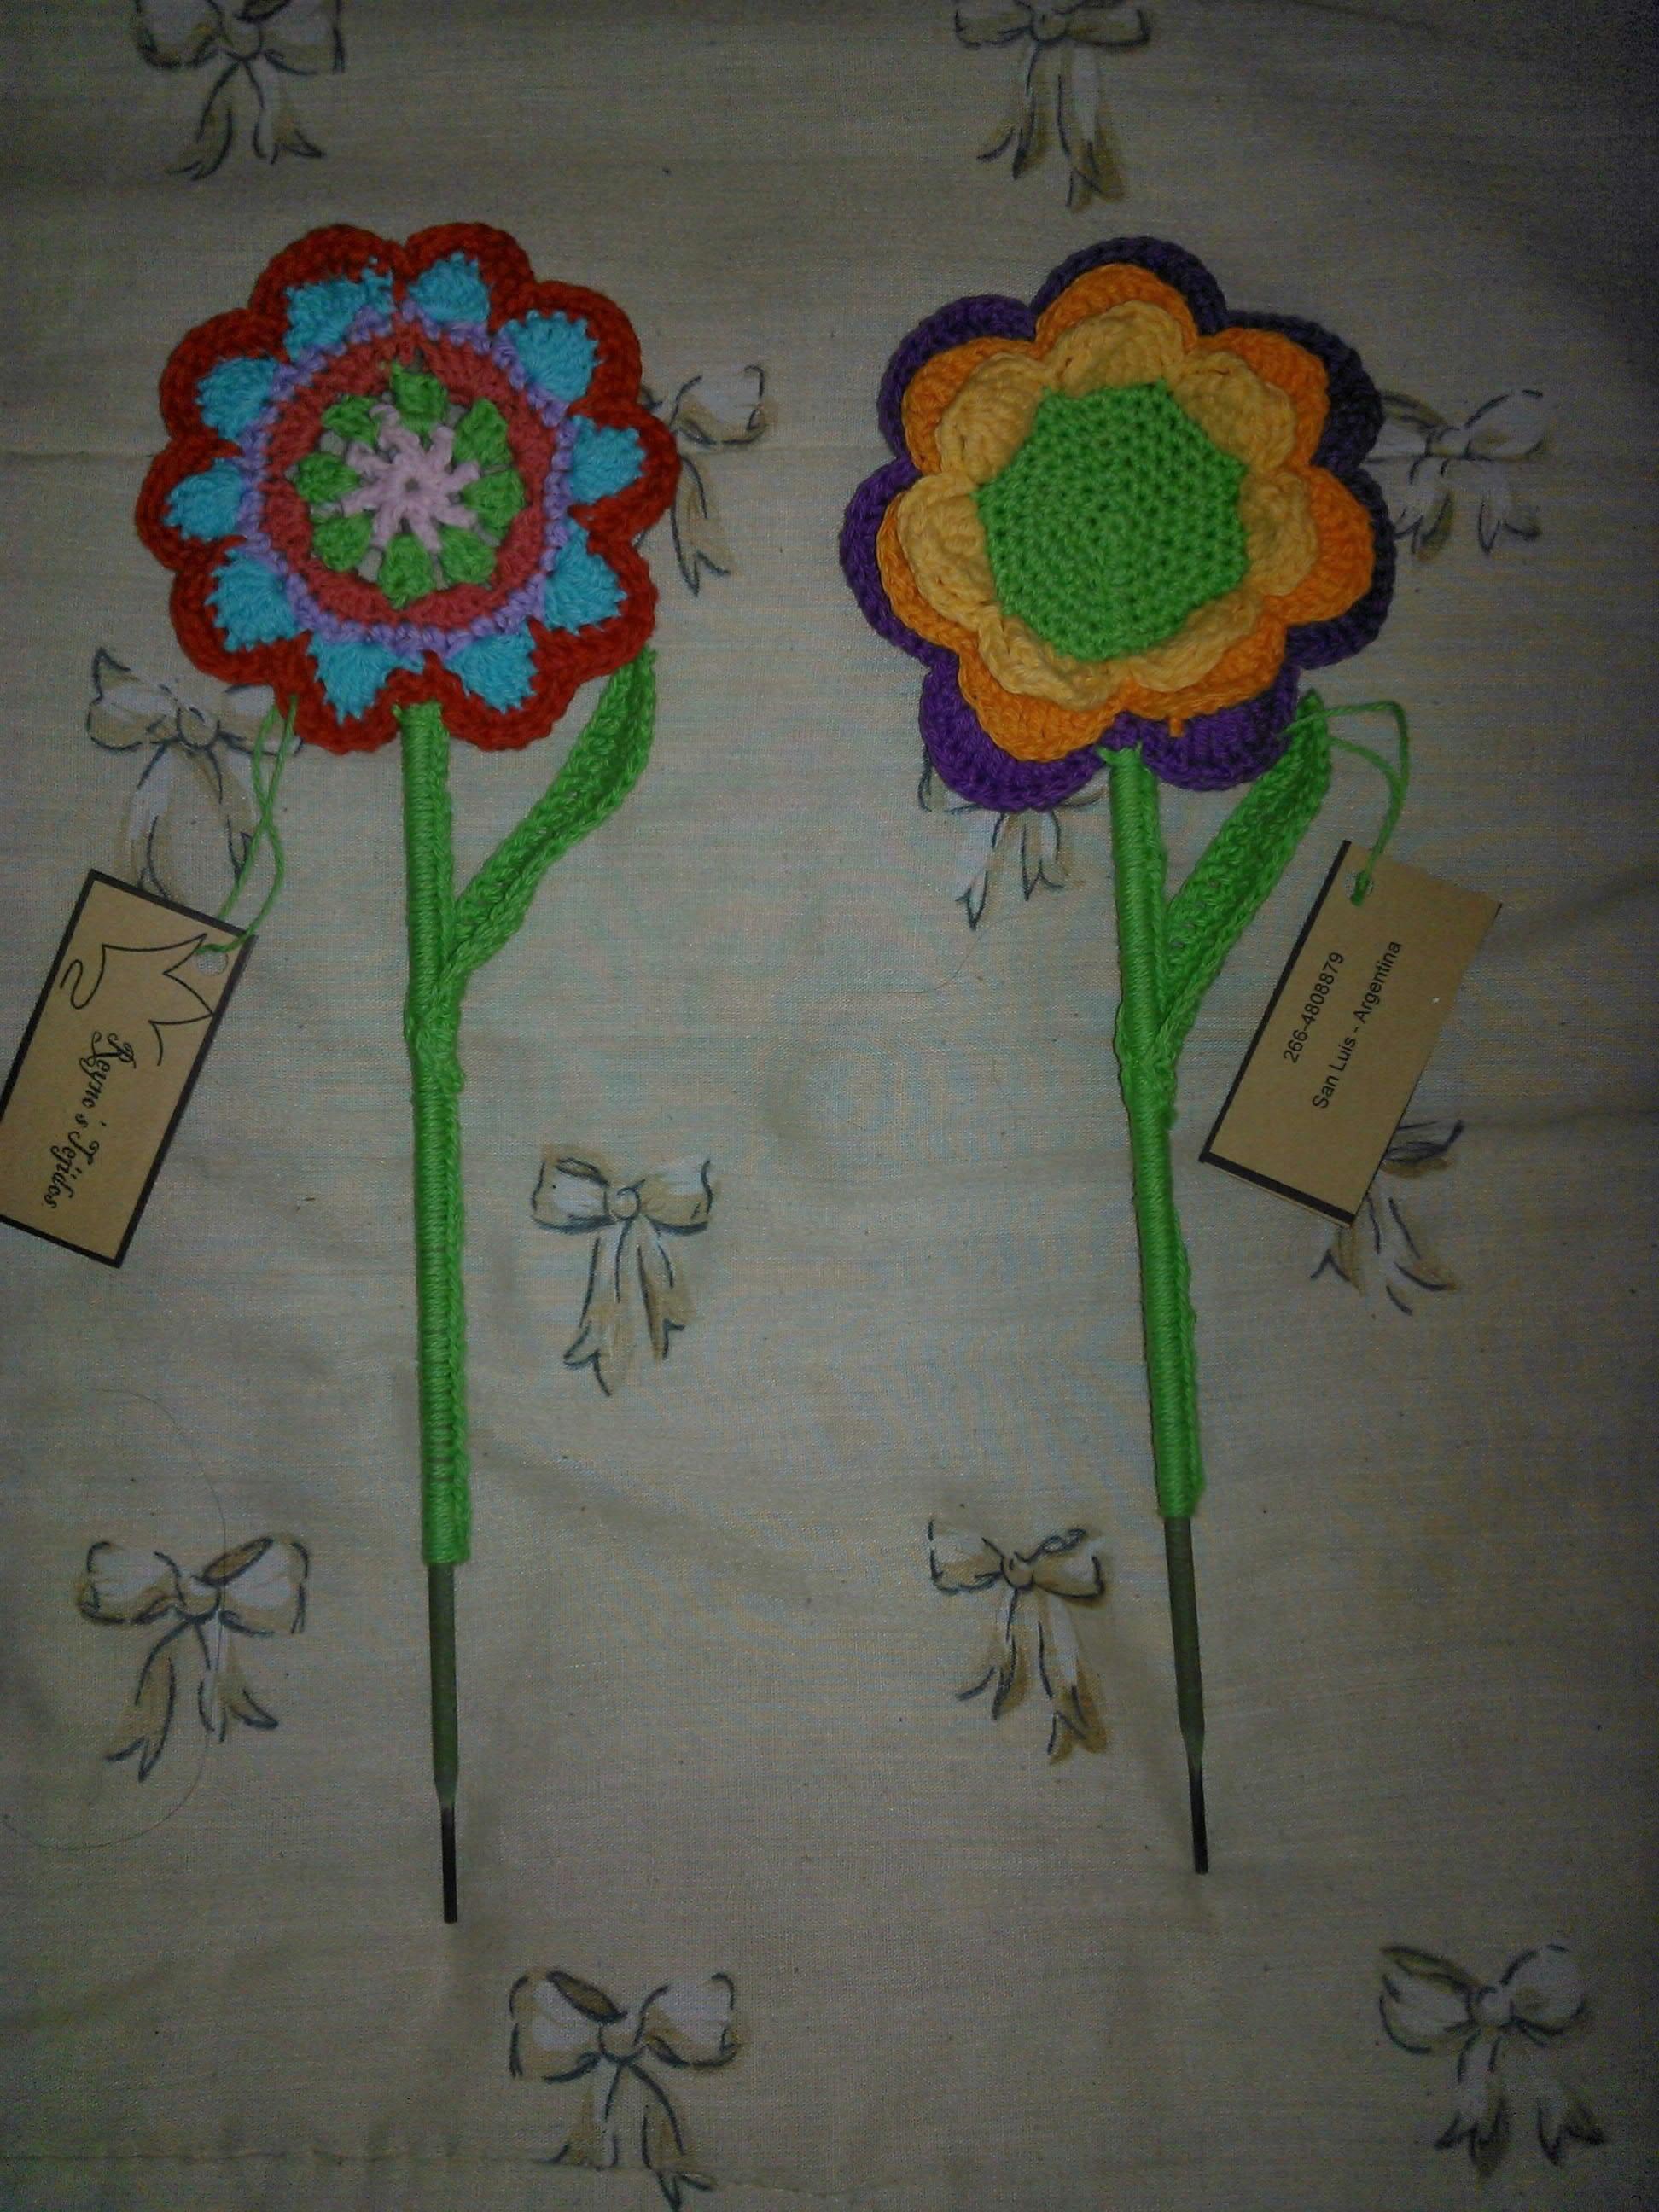 Adorno a crochet para macetas: flores de colores.